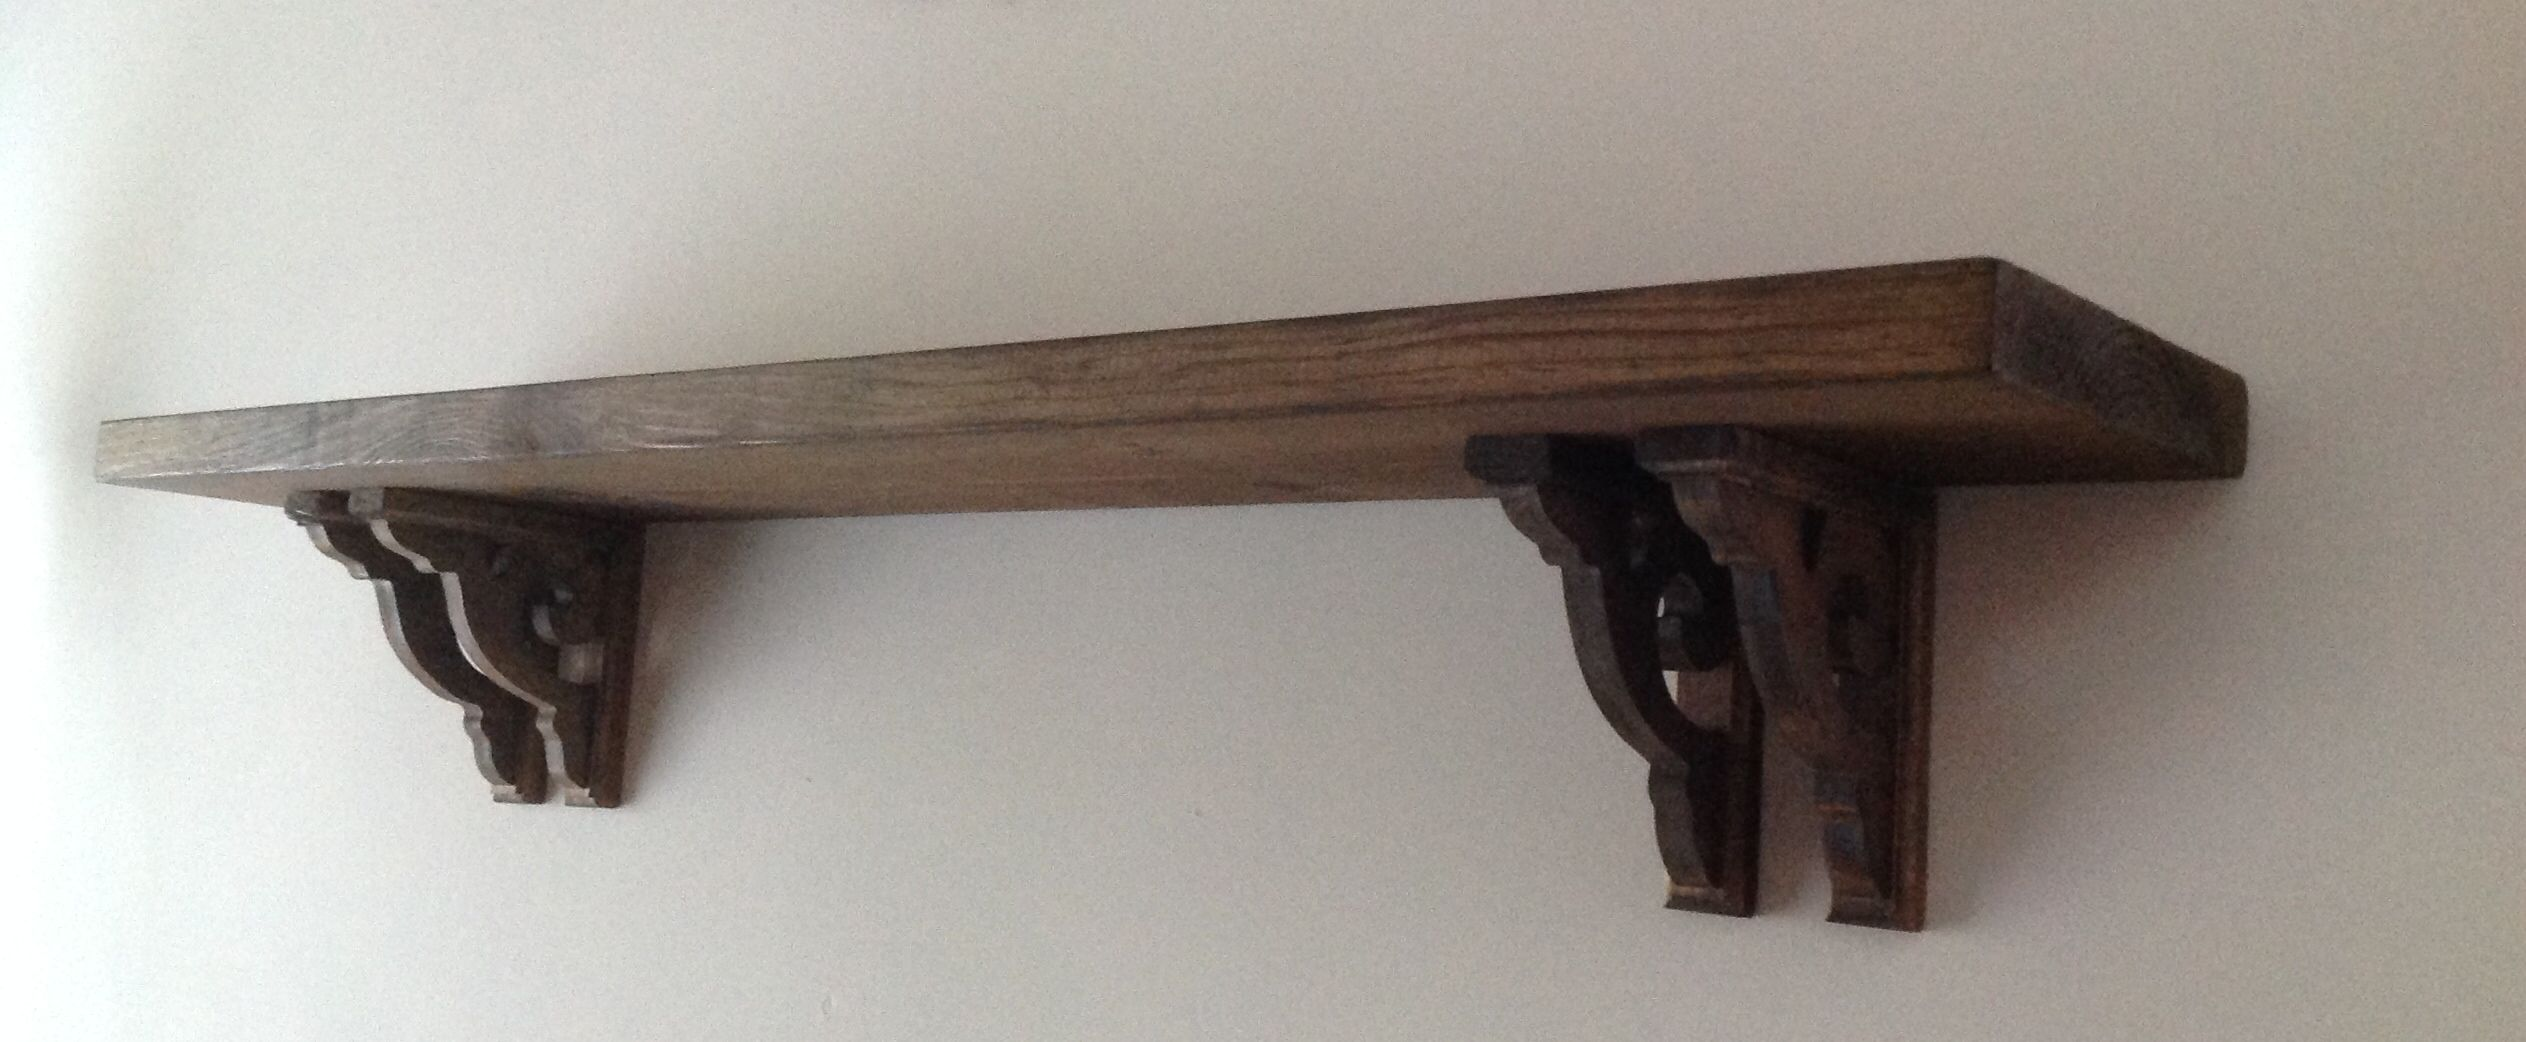 Diy shelf aaron and i made this using wood and shelf